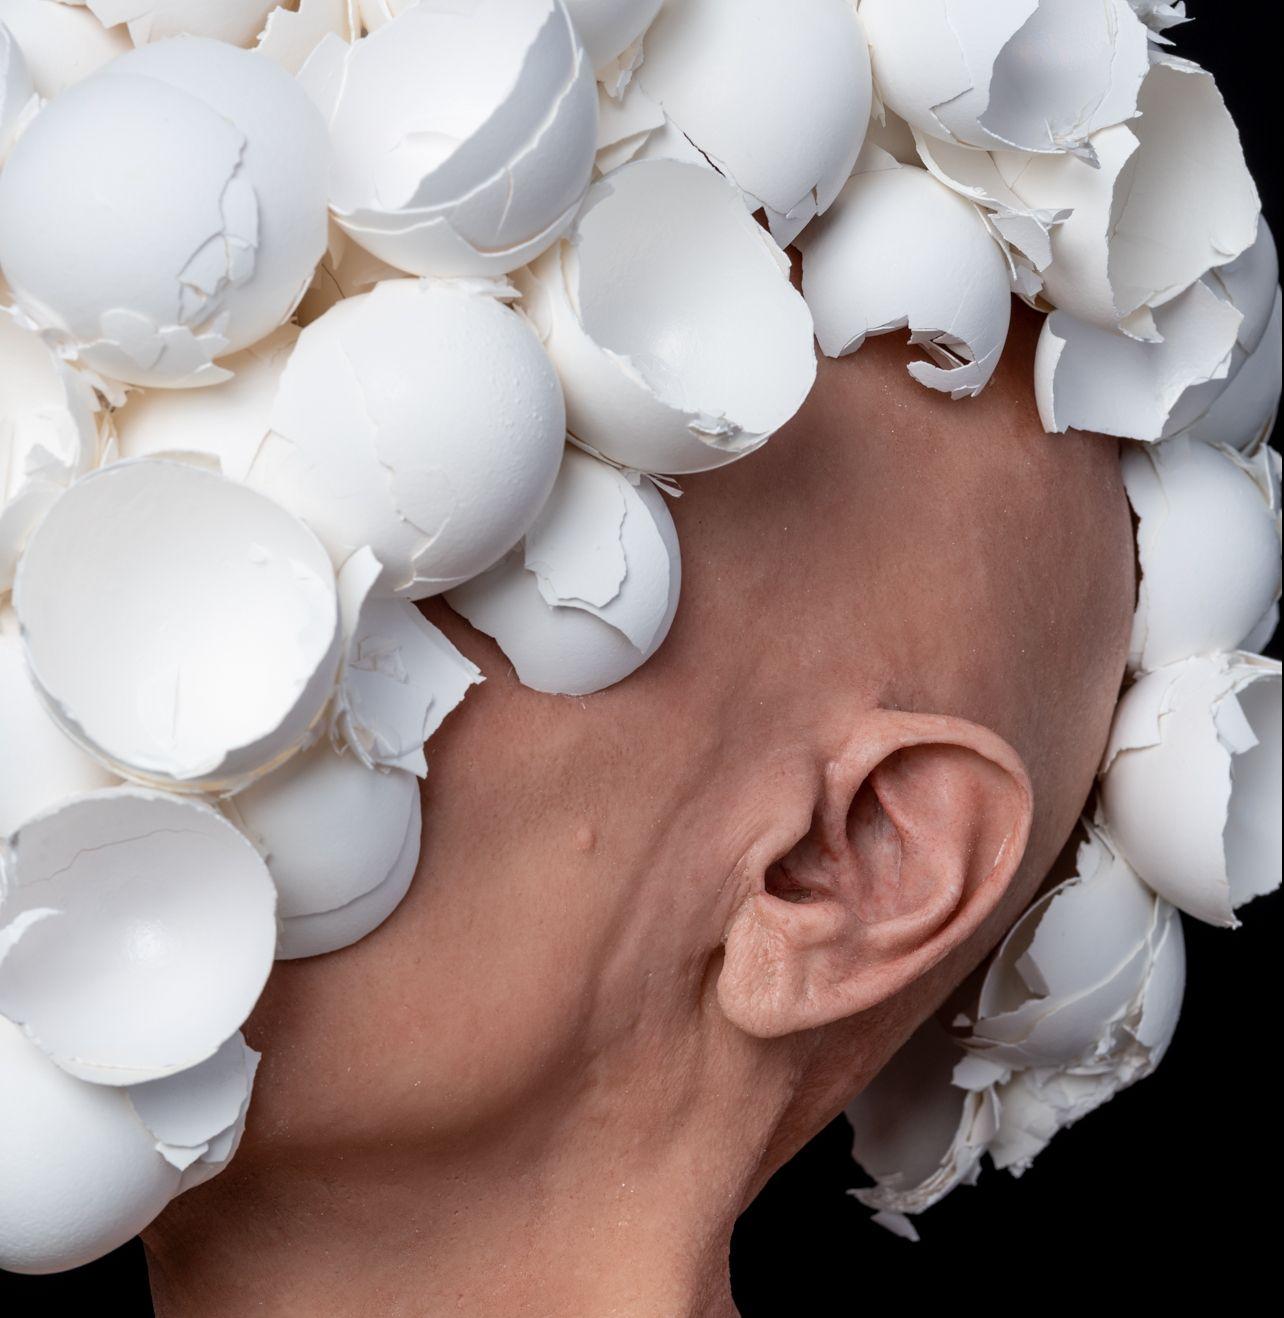 J.J. McCracken, The Feeding, 2020, painted platinum silicone lifecast, eggshells, ceramic, 22 x 16 x 12 inches.